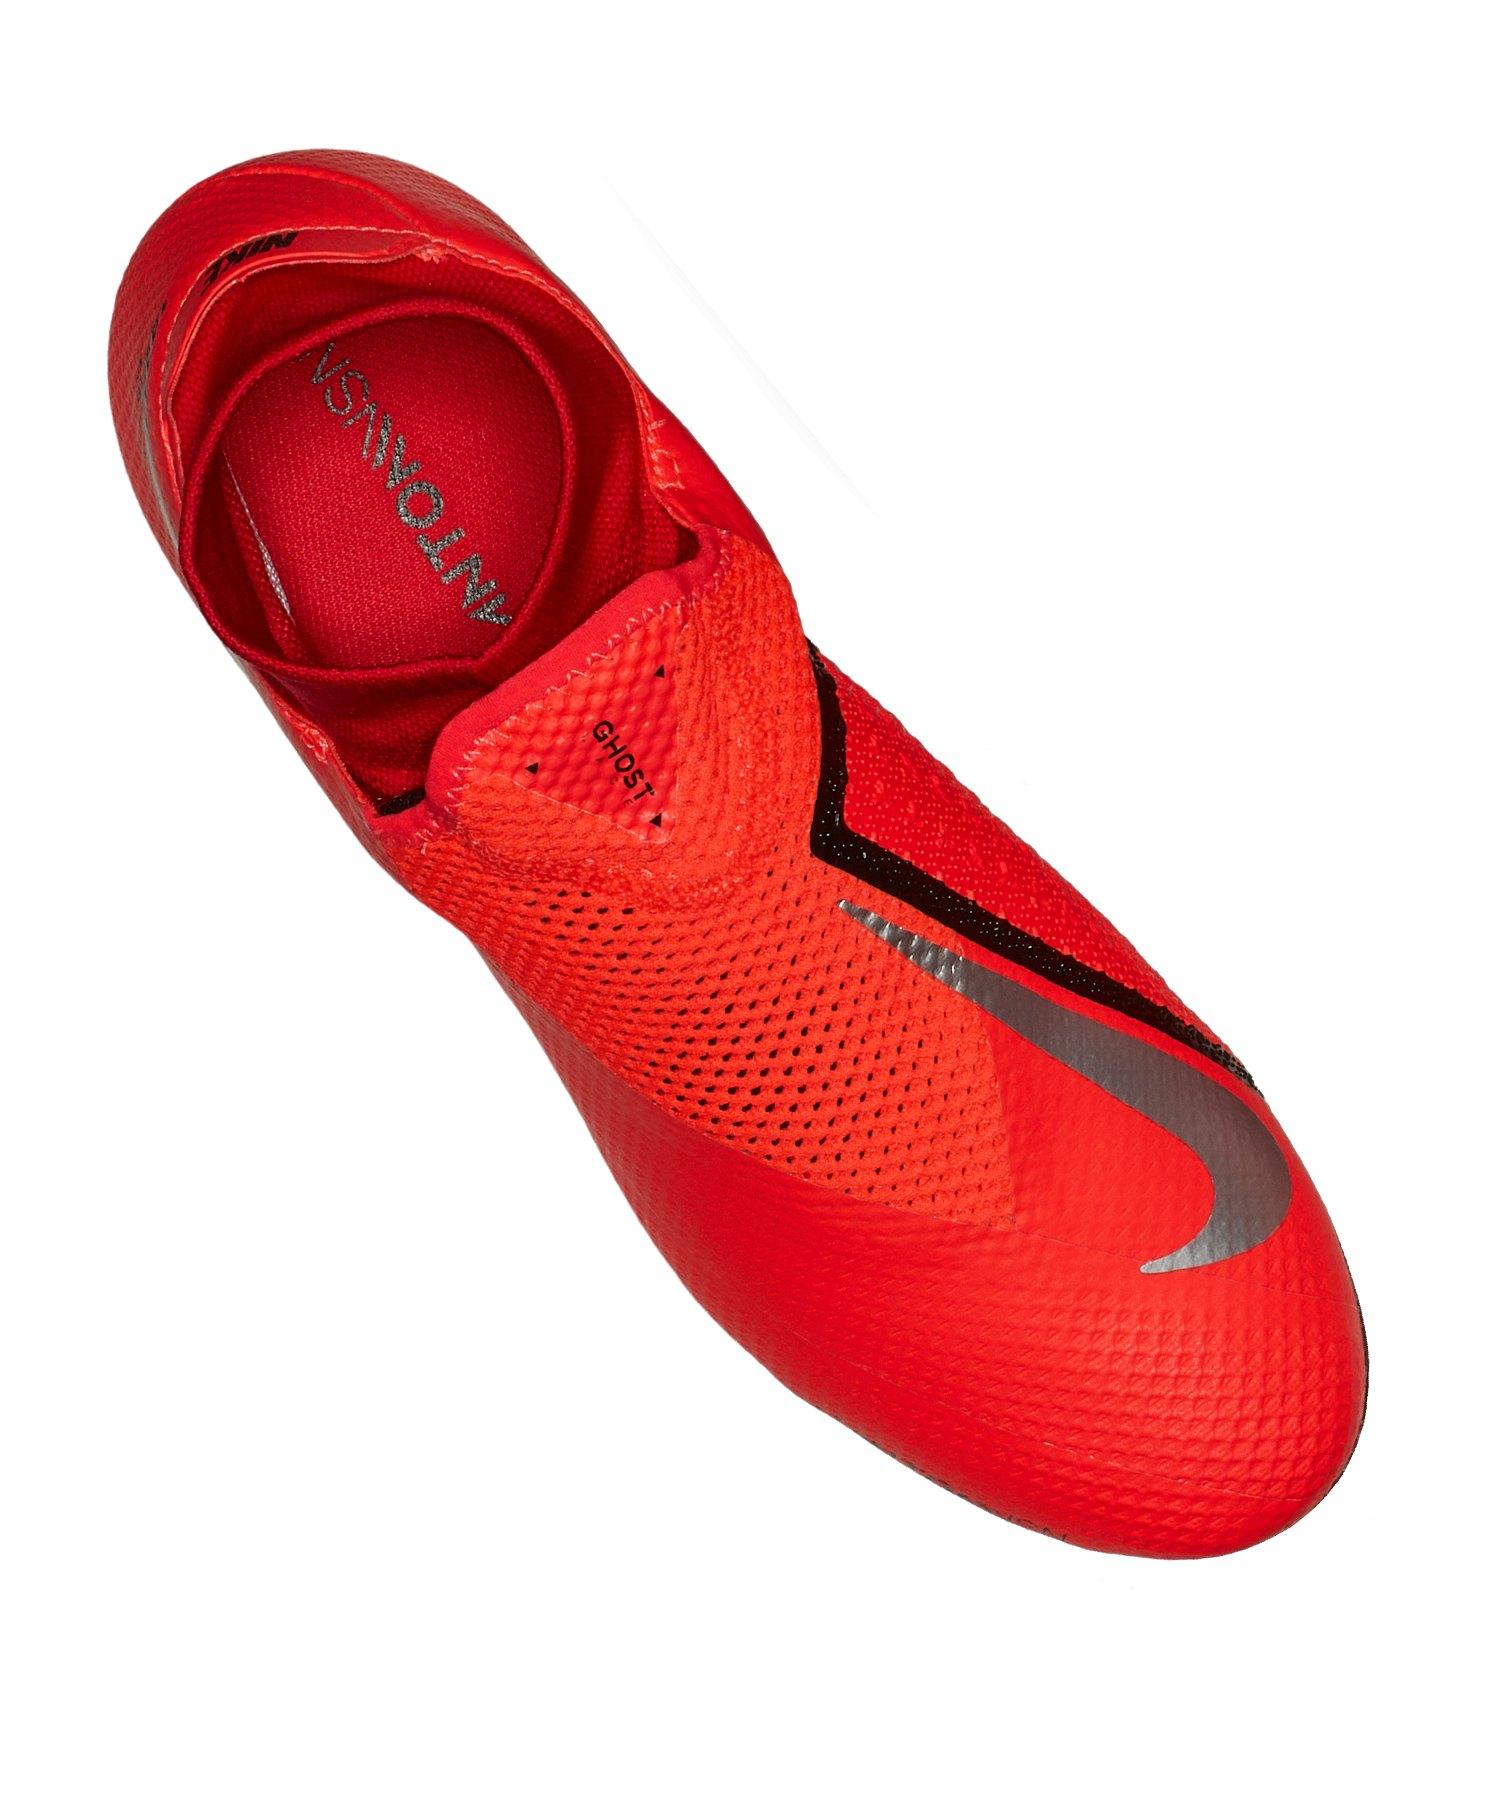 d3efd41d3 ... Nike Phantom Vision Pro AG-Pro Rot F600 - rot ...